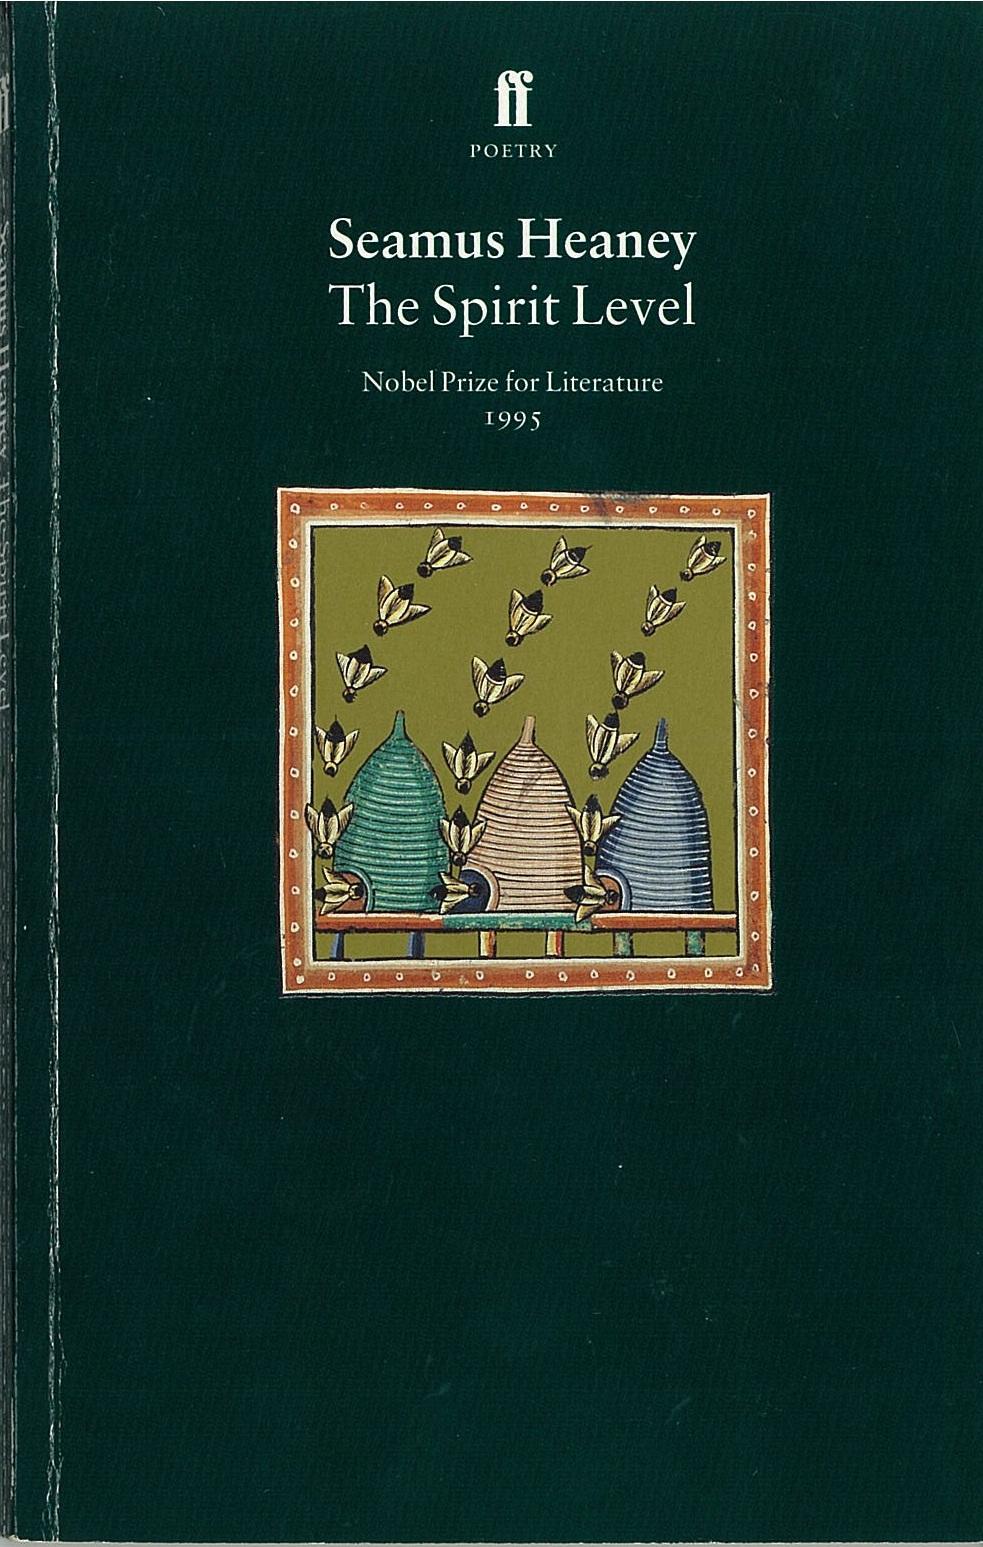 the spirit level by seamus heaney essay